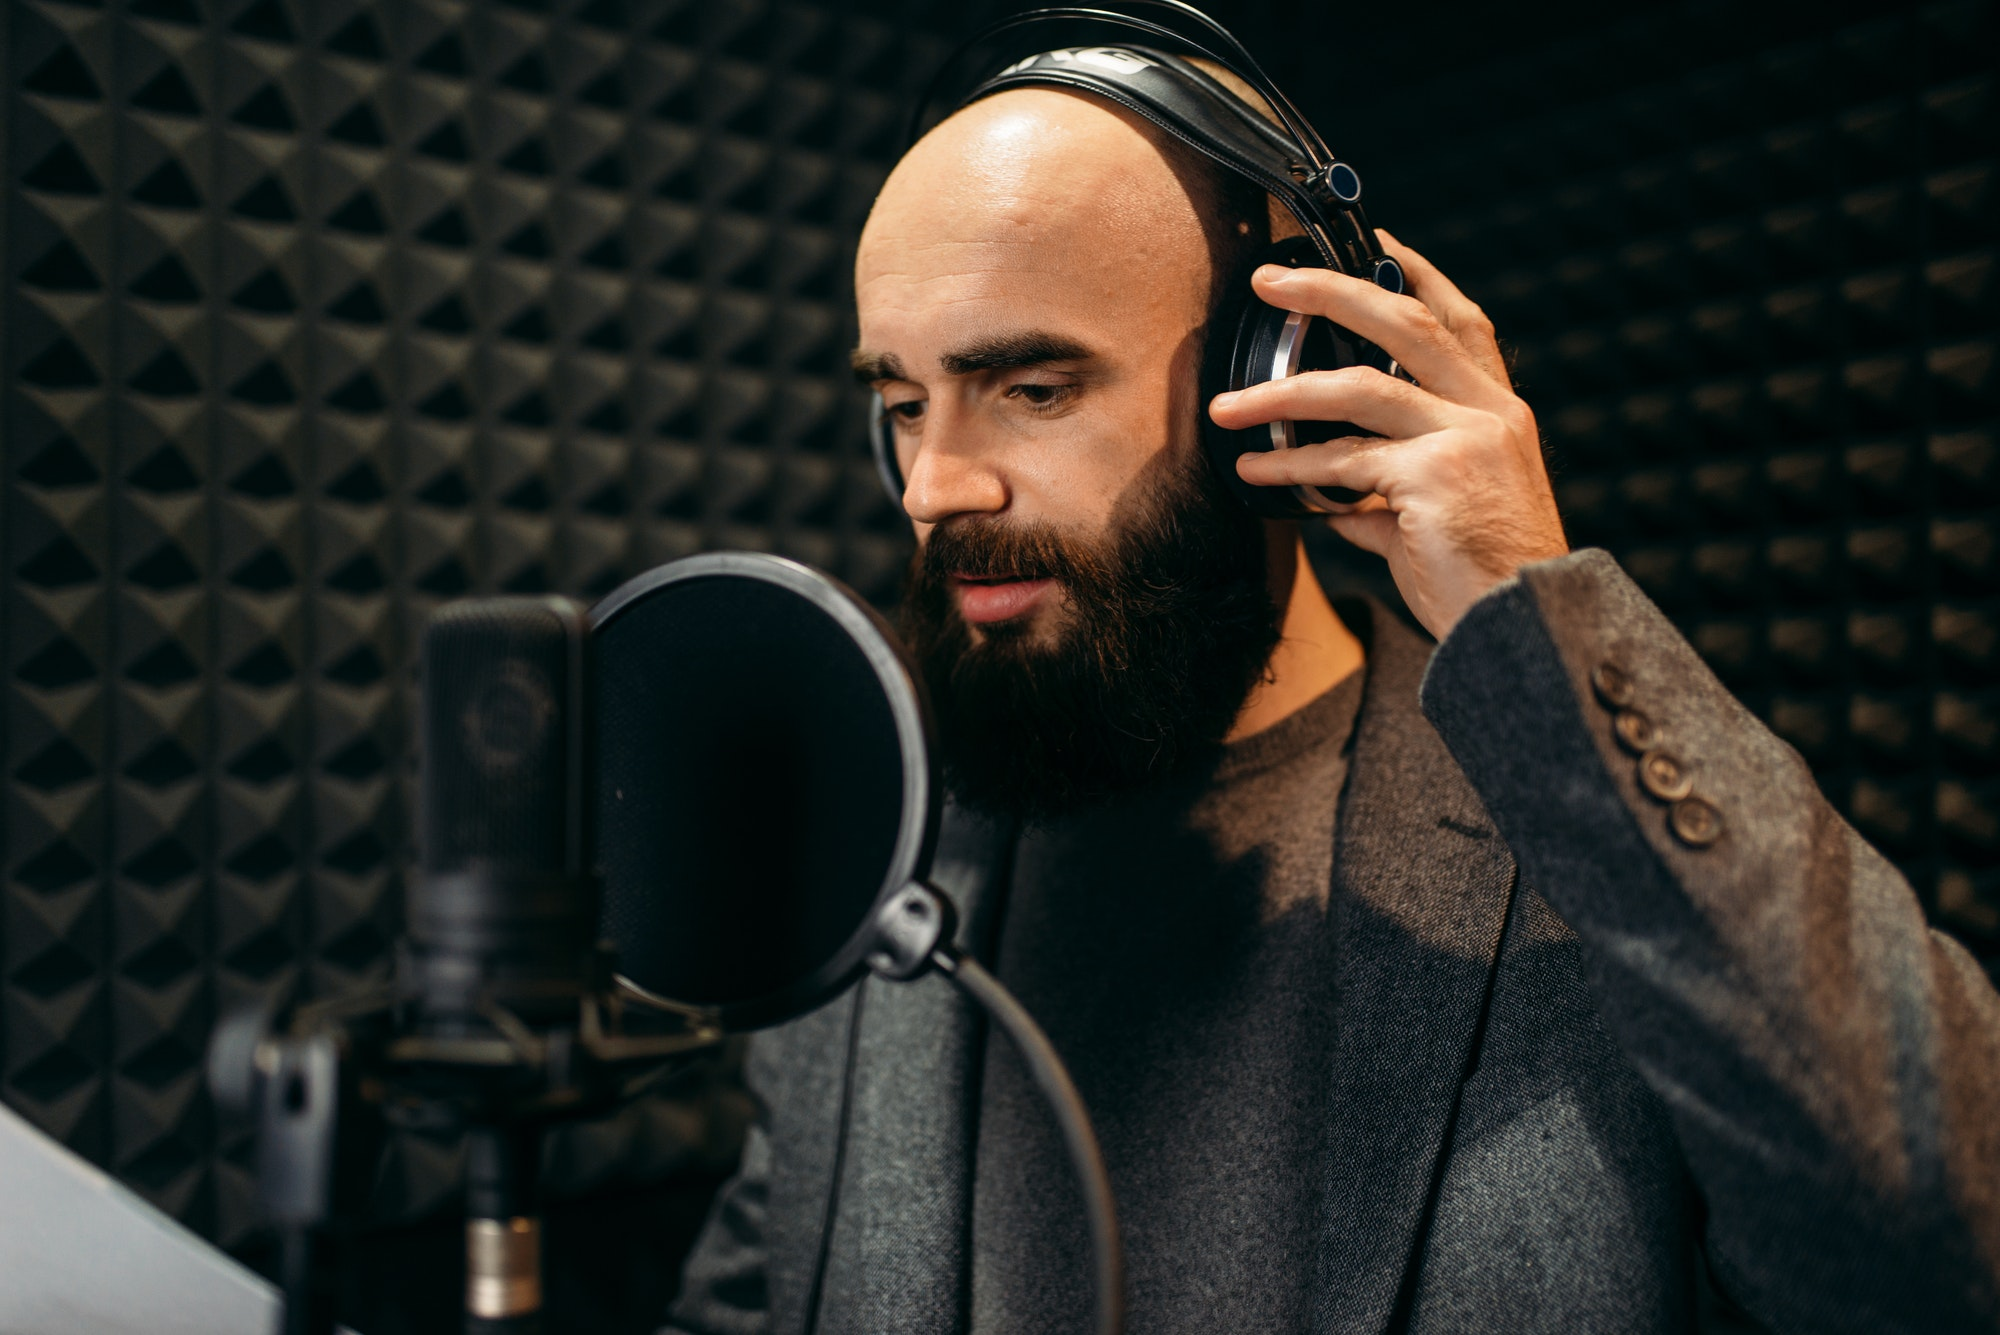 Male singer songs in audio recording studio